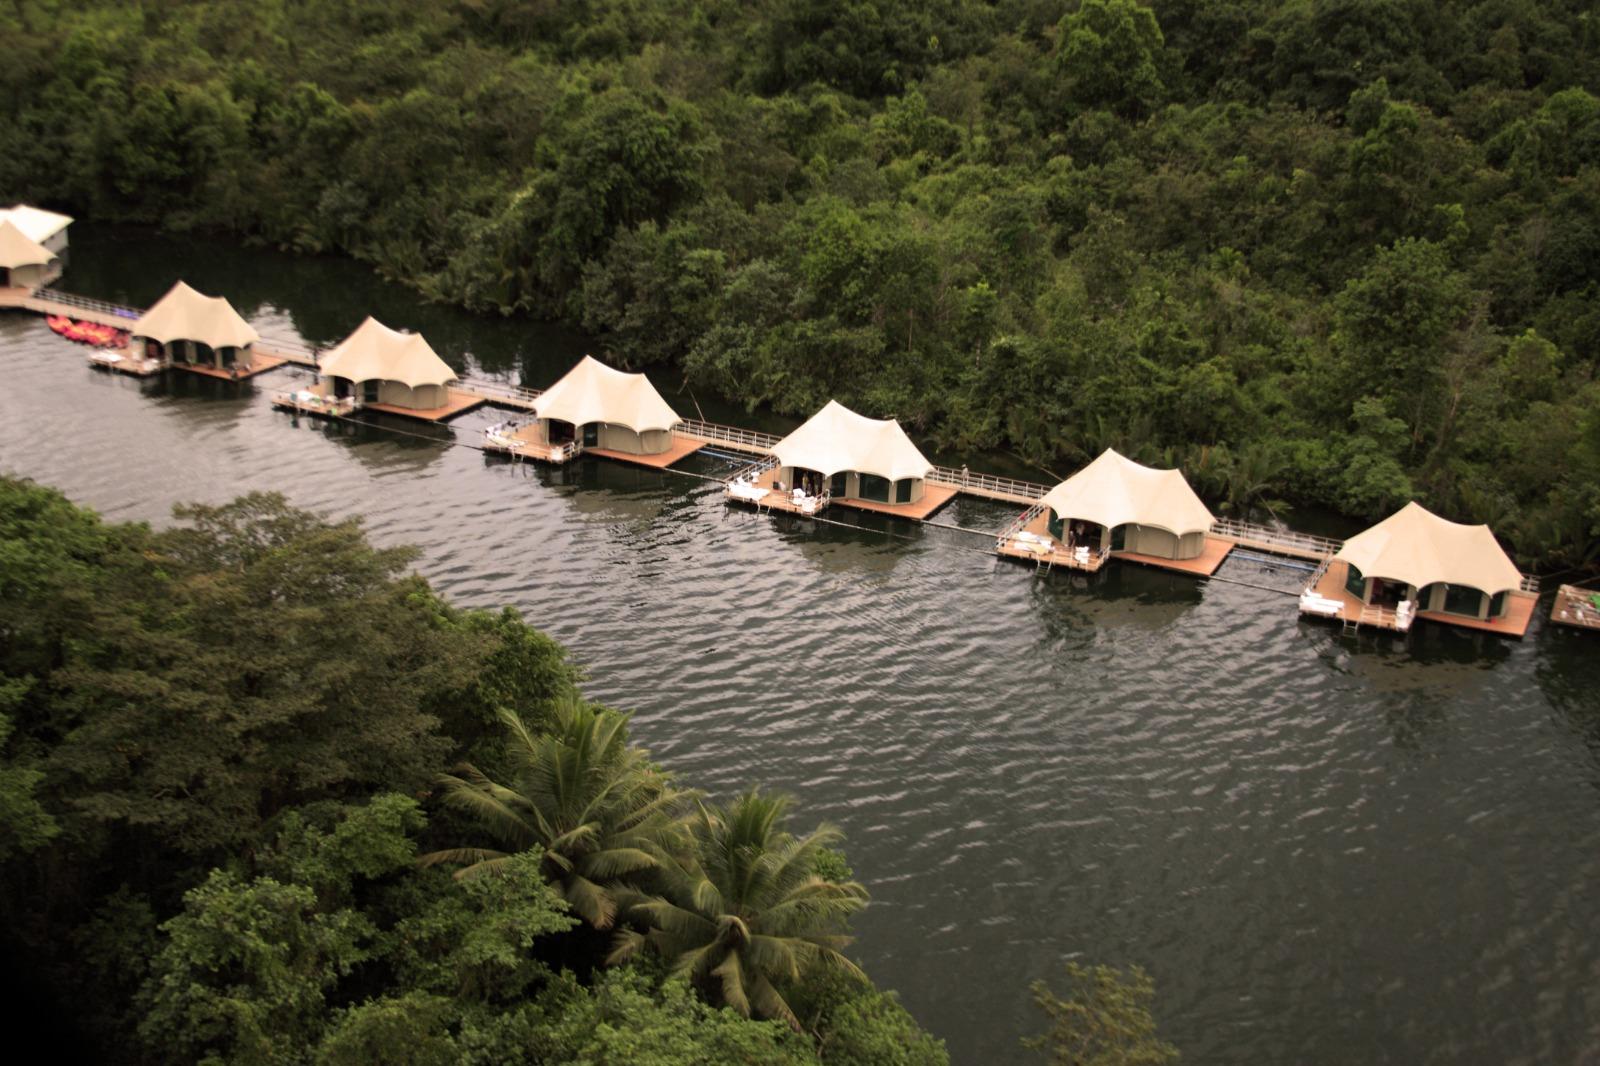 Master Manufacuturers of Luxury Safari Tents